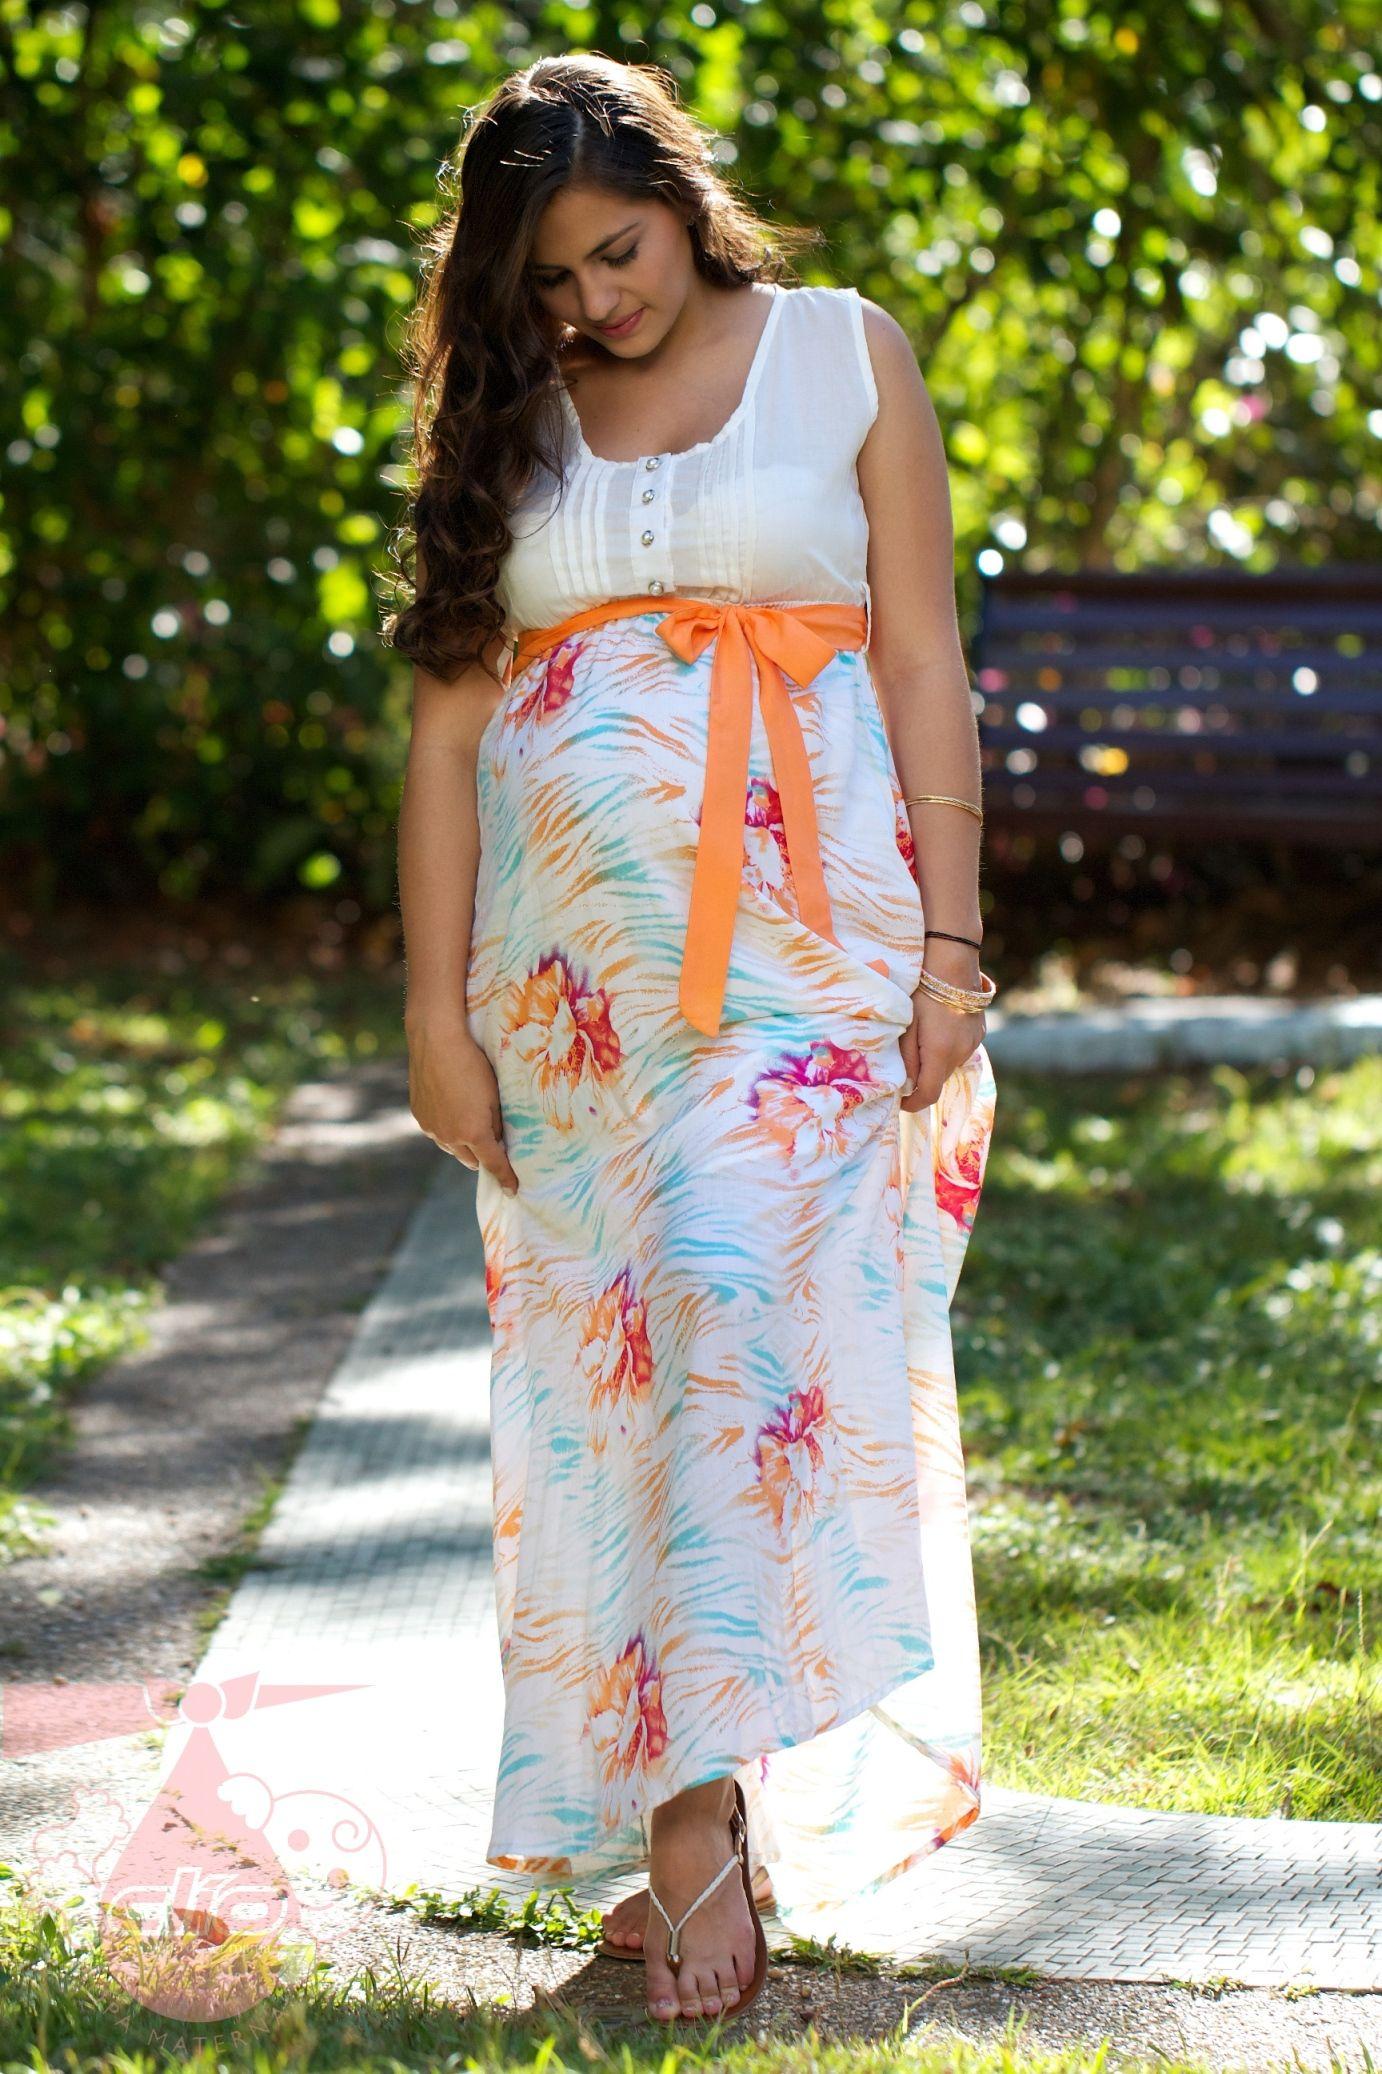 7167e3e2f  Vestido  materno con diseño para fiesta.  Ropa  moderna para el  embarazo